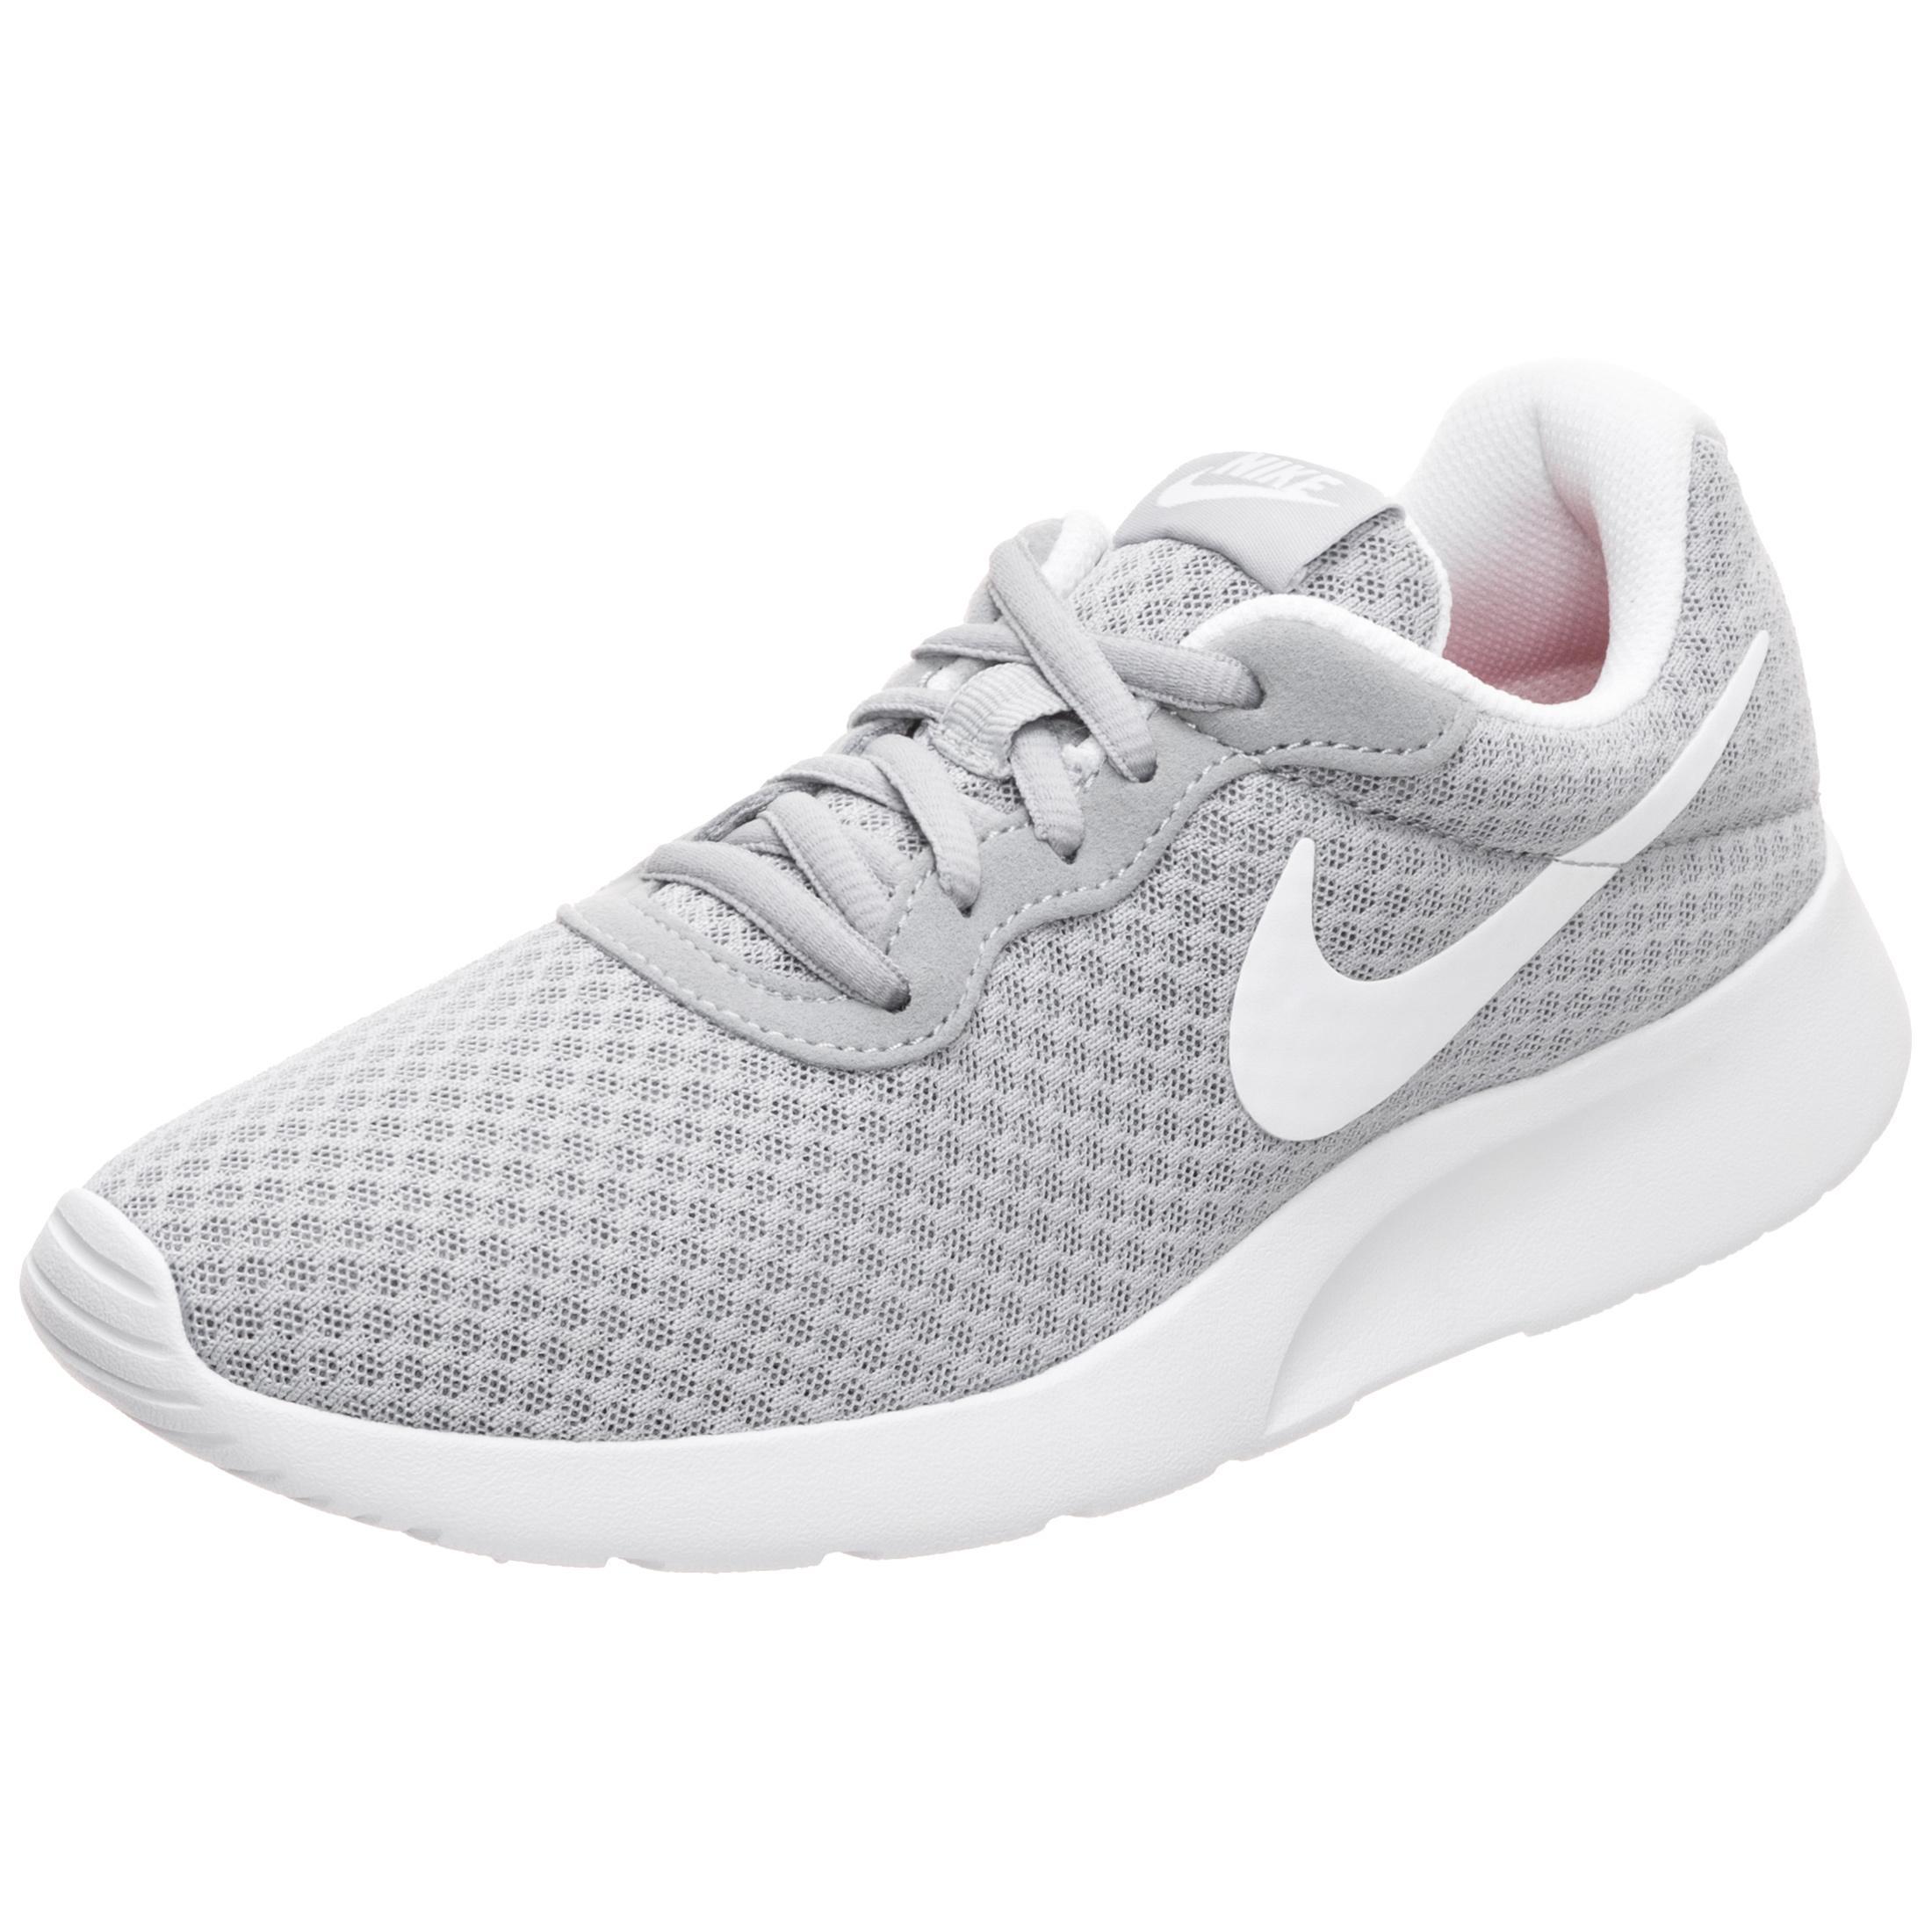 Nike Nike Tanjun Sneaker Damen grau / weiß im Online Shop von ...